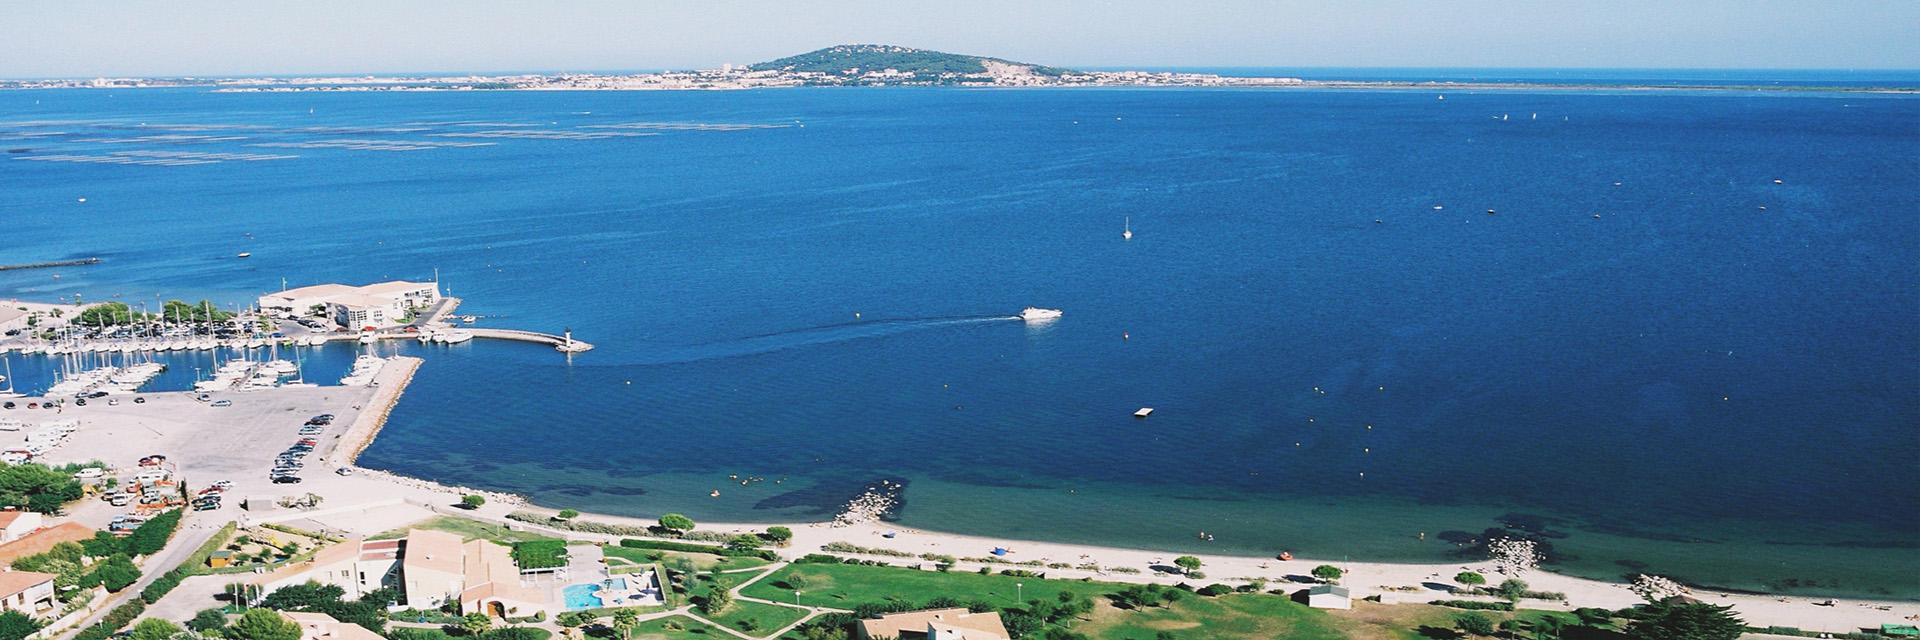 Village_club_vacances_mediterranee-sud-est-village-club-thalasse-mere